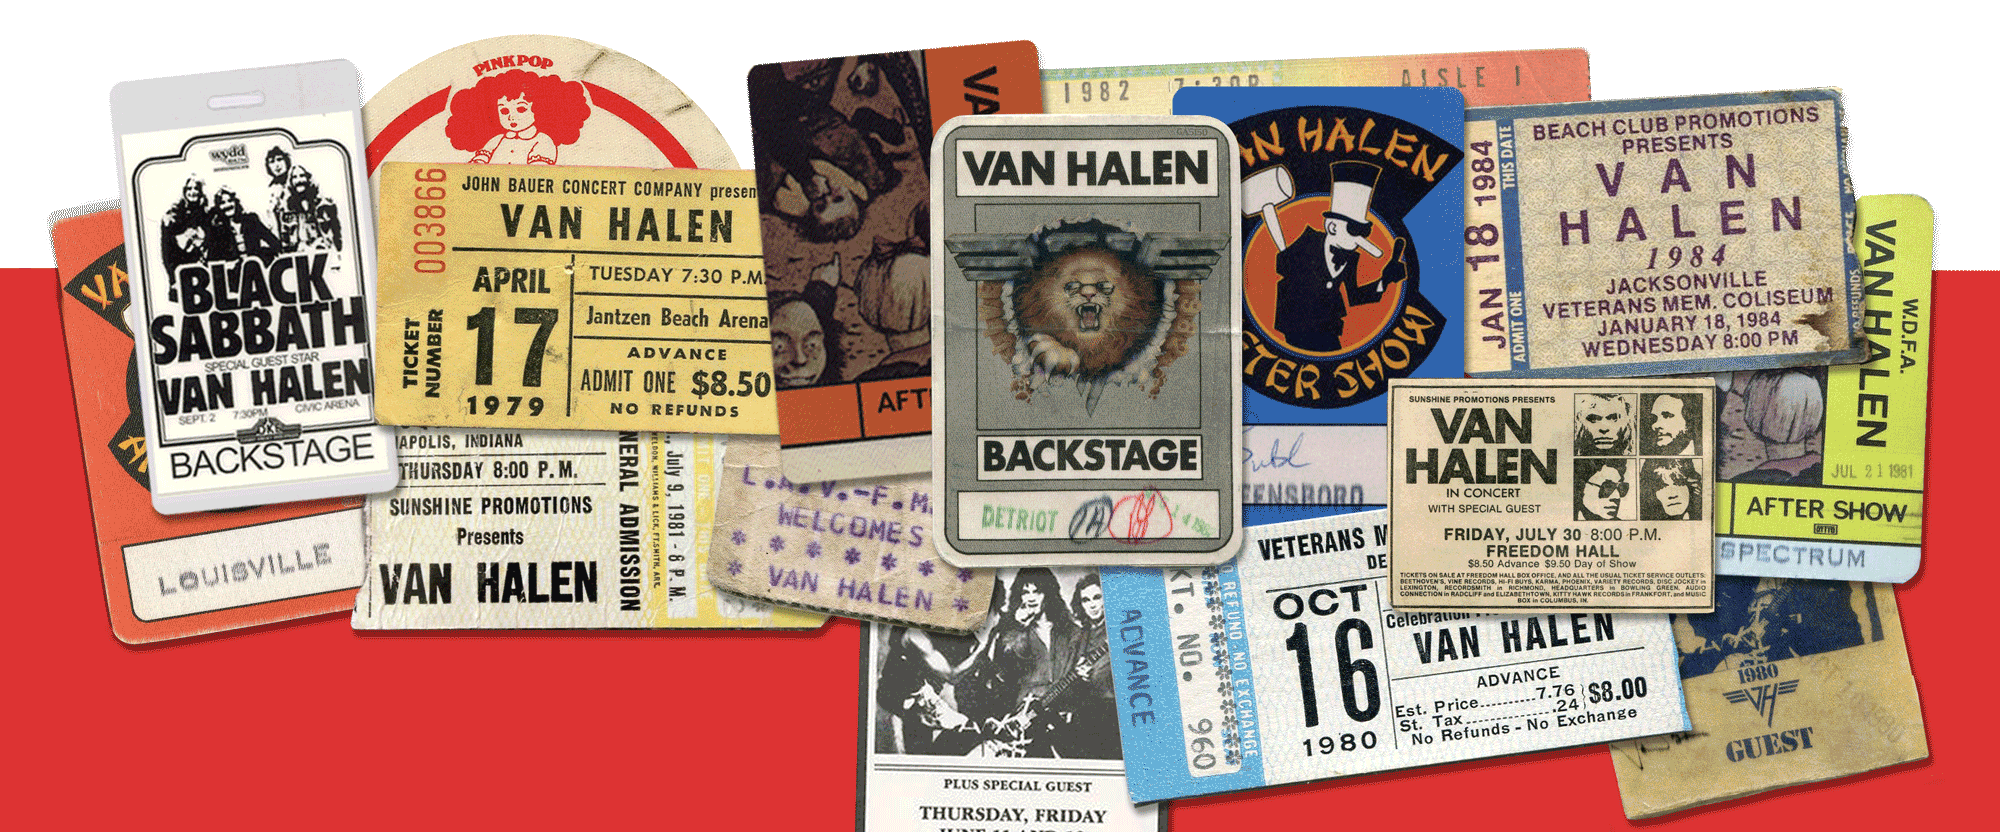 Van Halen Tour Date Archive